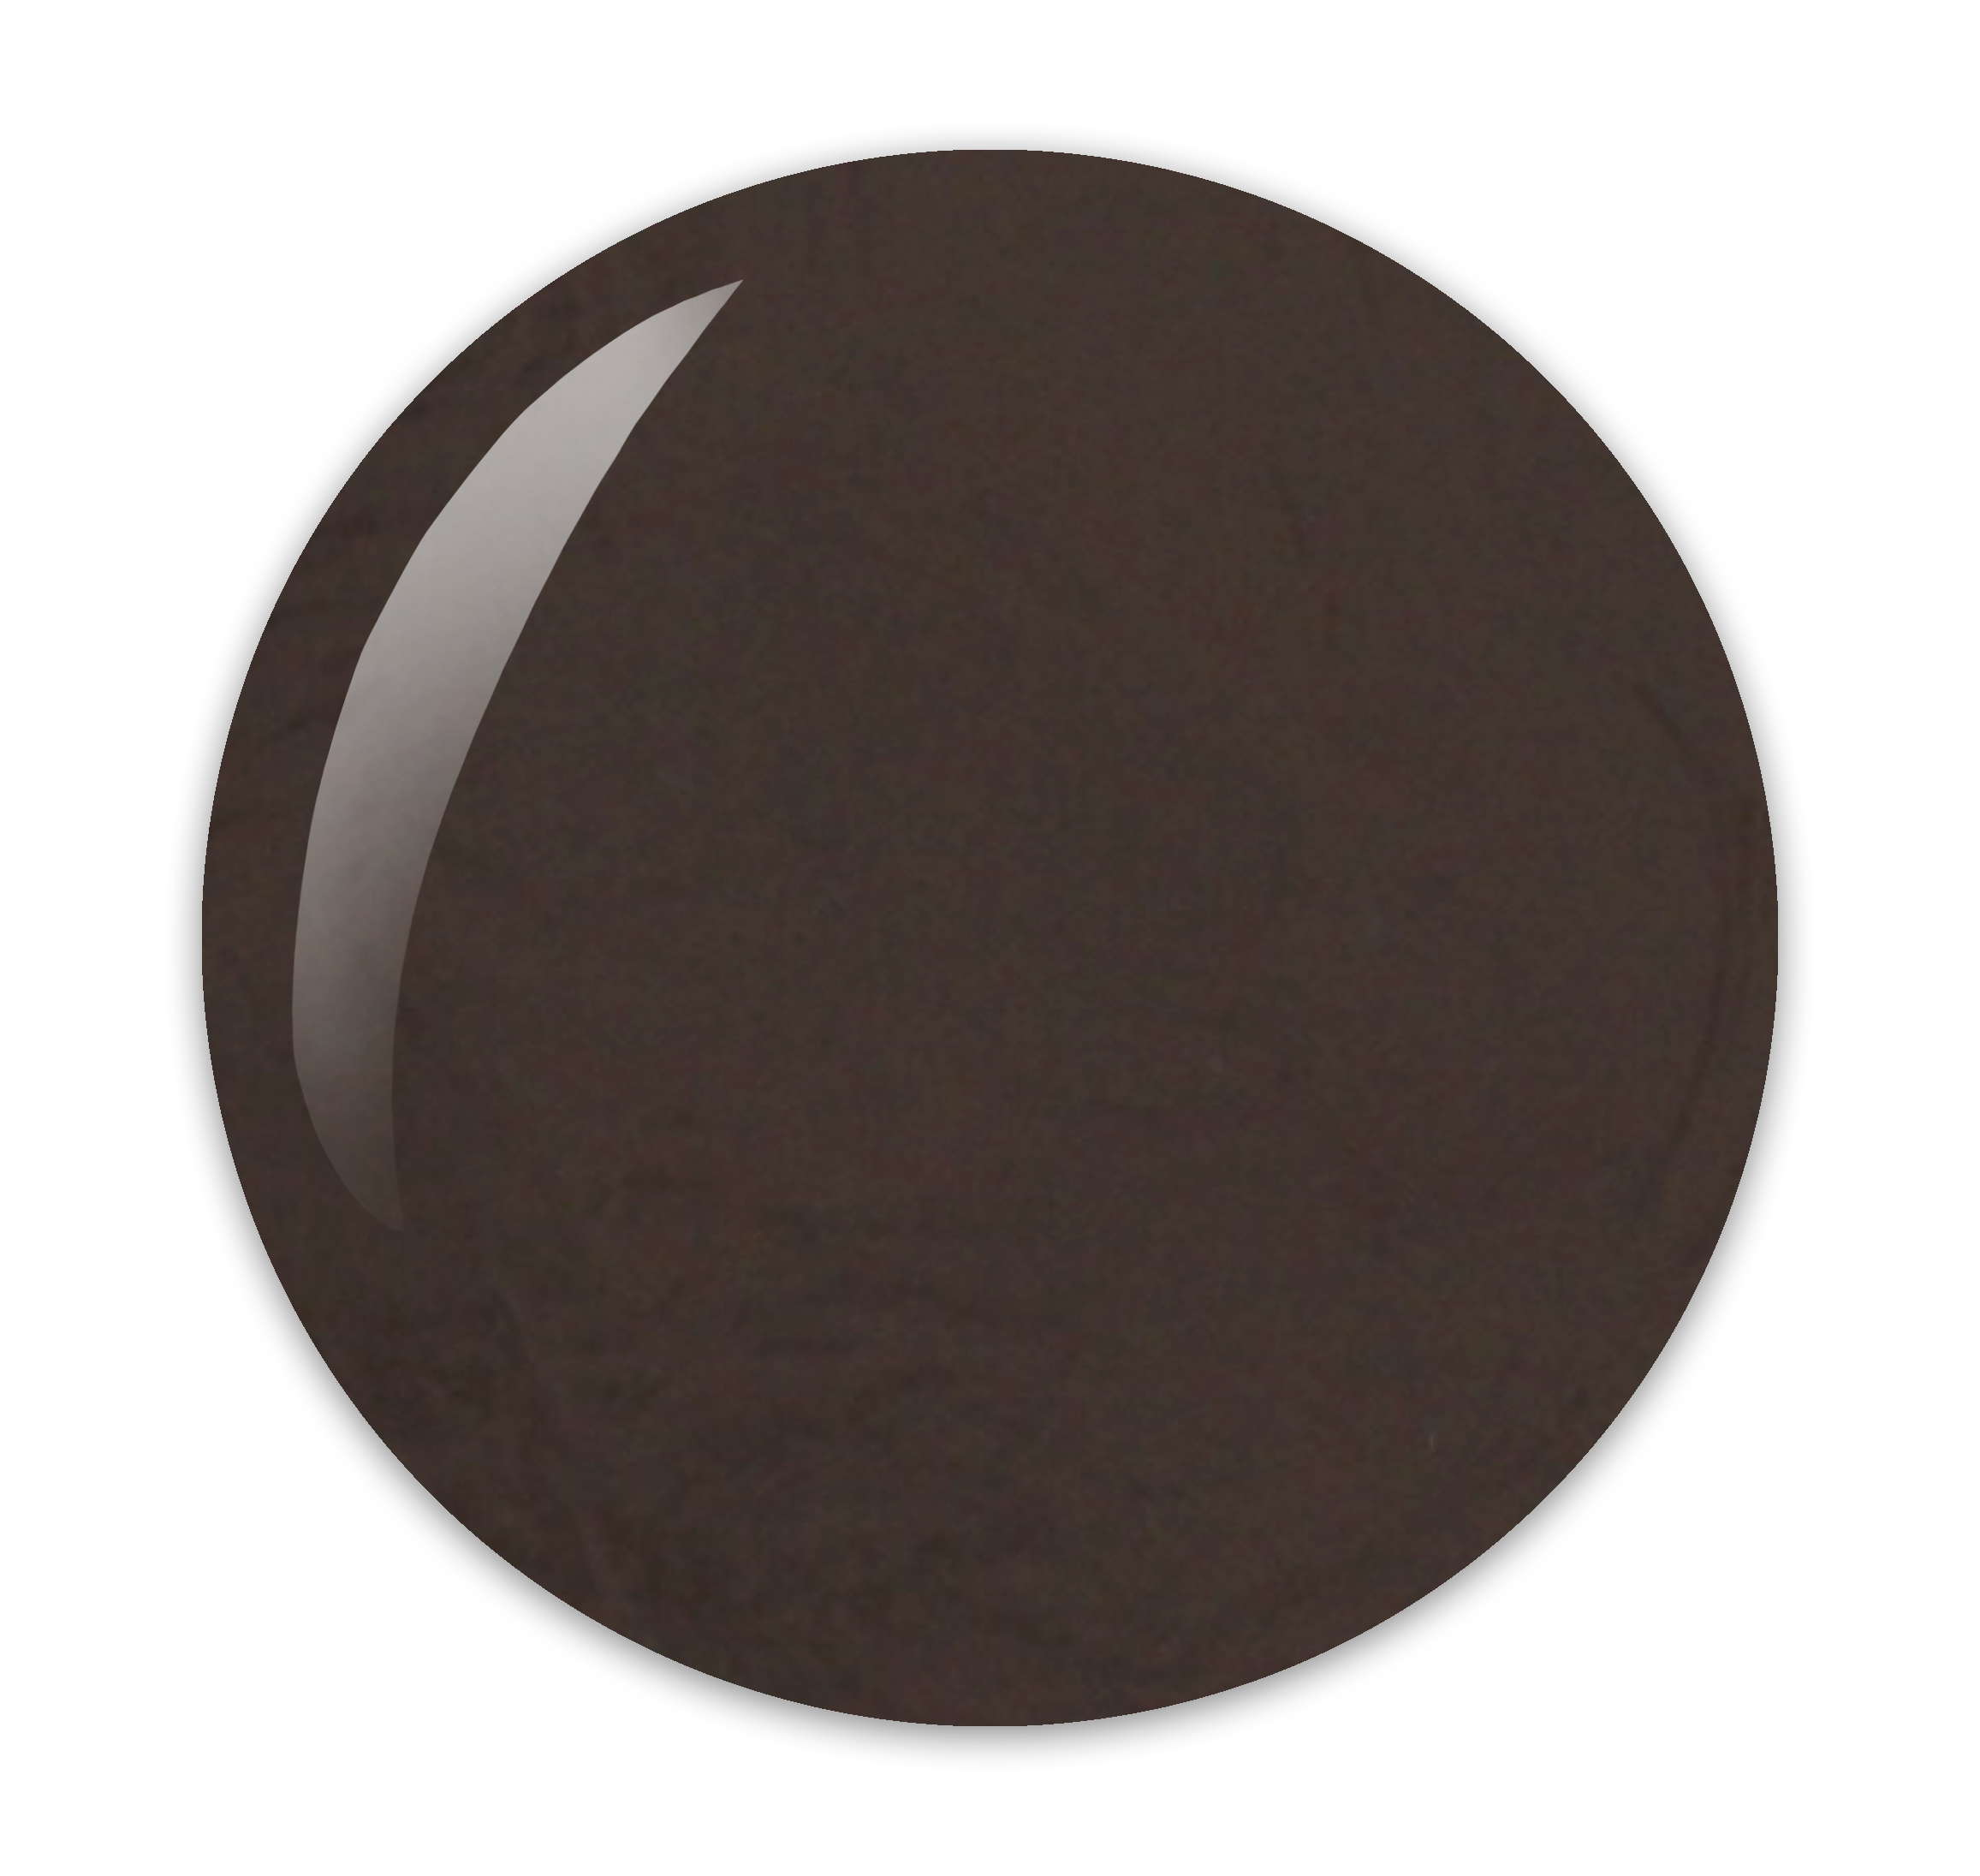 Chocolade bruine nagellak nummer 89 van Herôme nagellak collectie